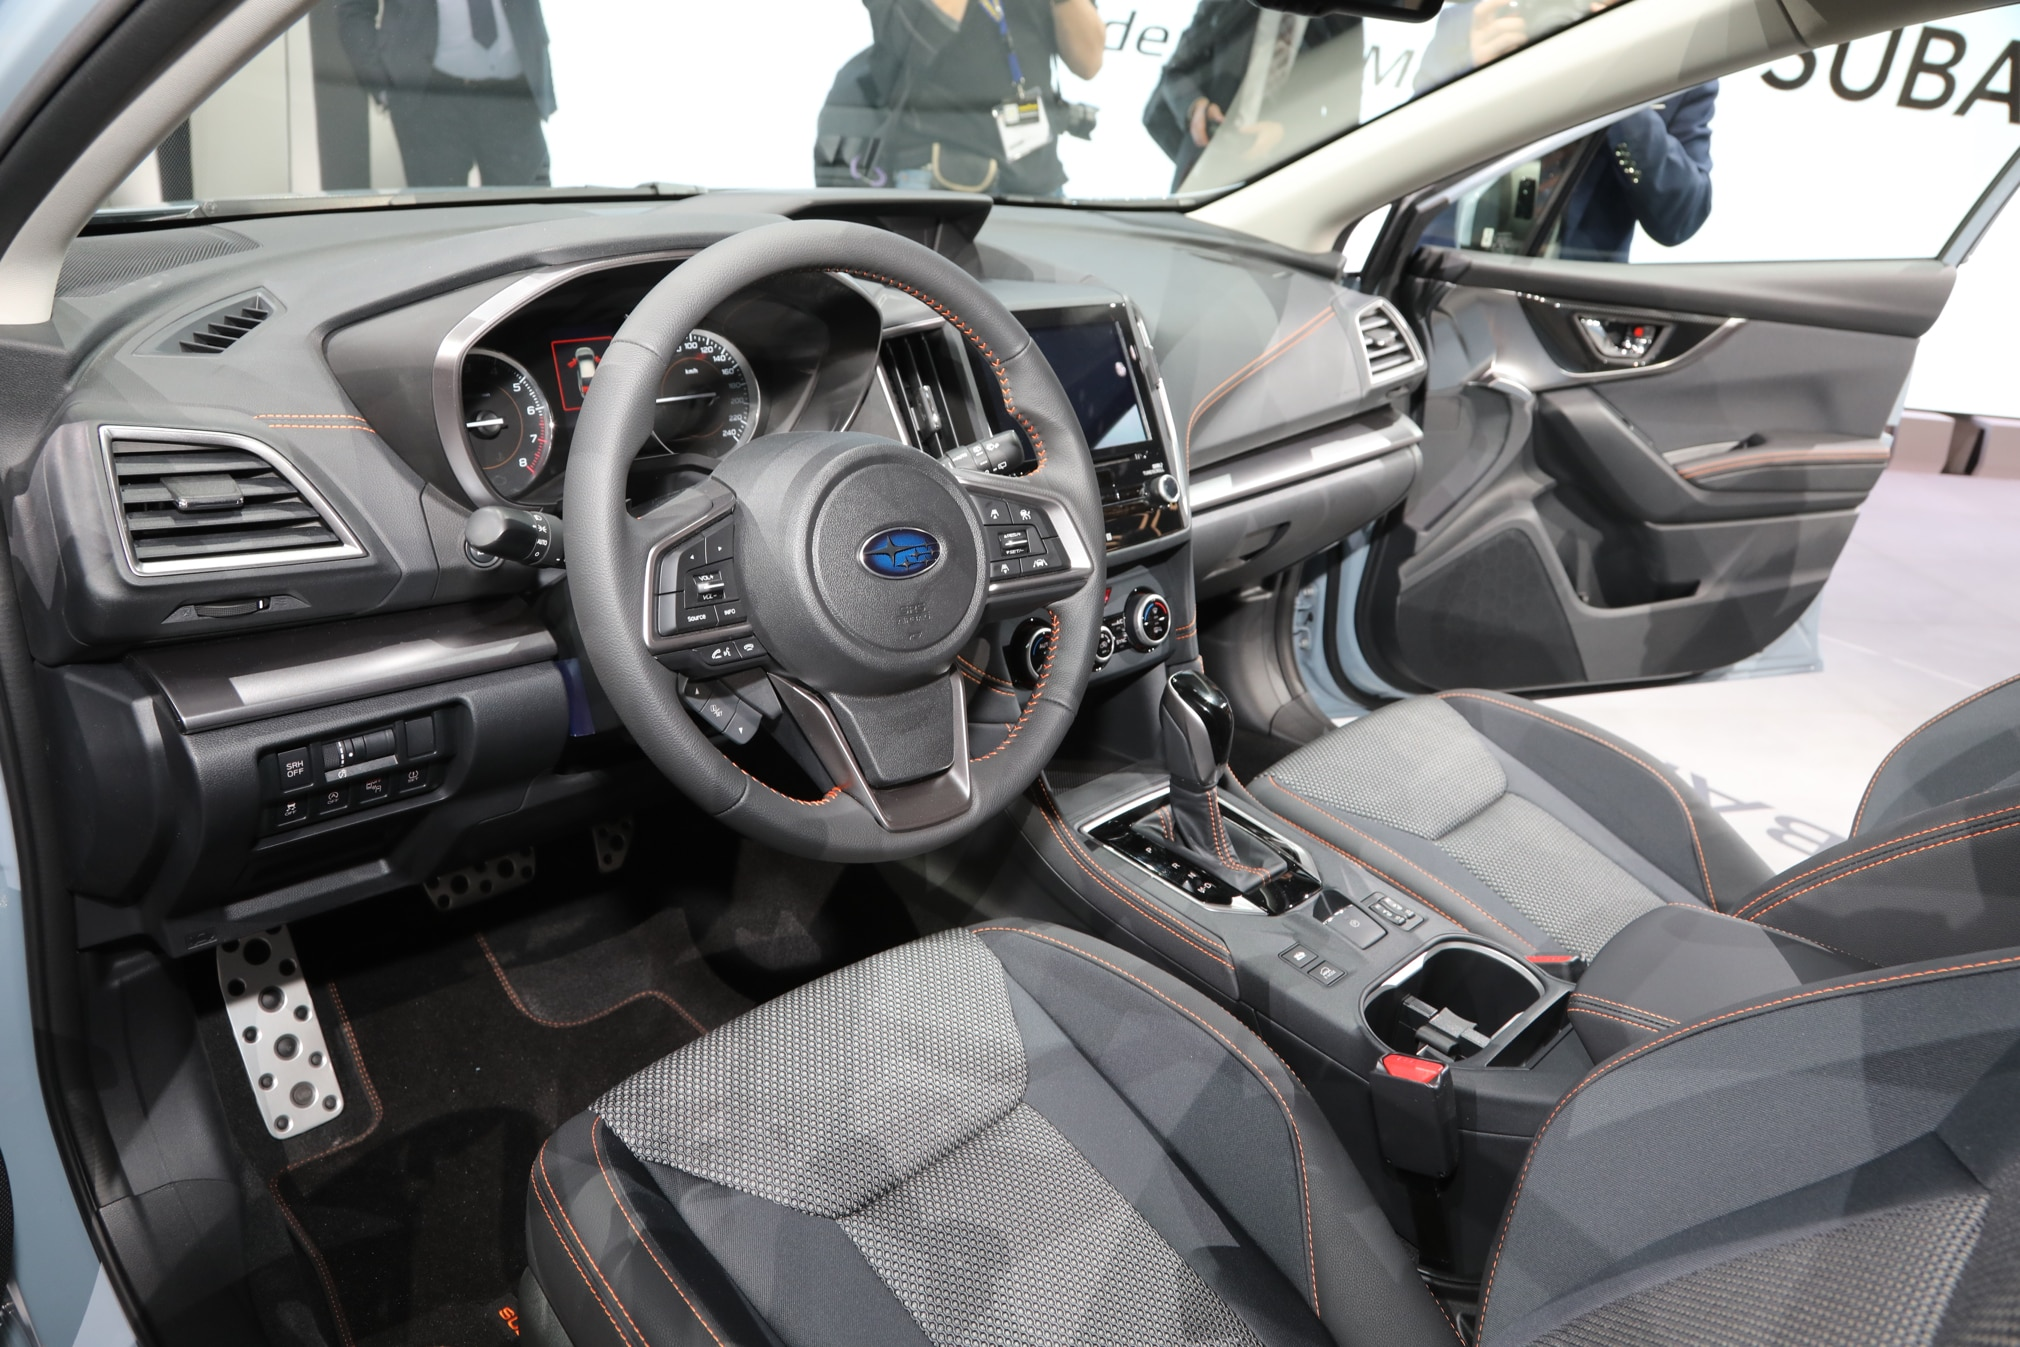 2018 Subaru Crosstrek Debuts in Geneva | Automobile Magazine